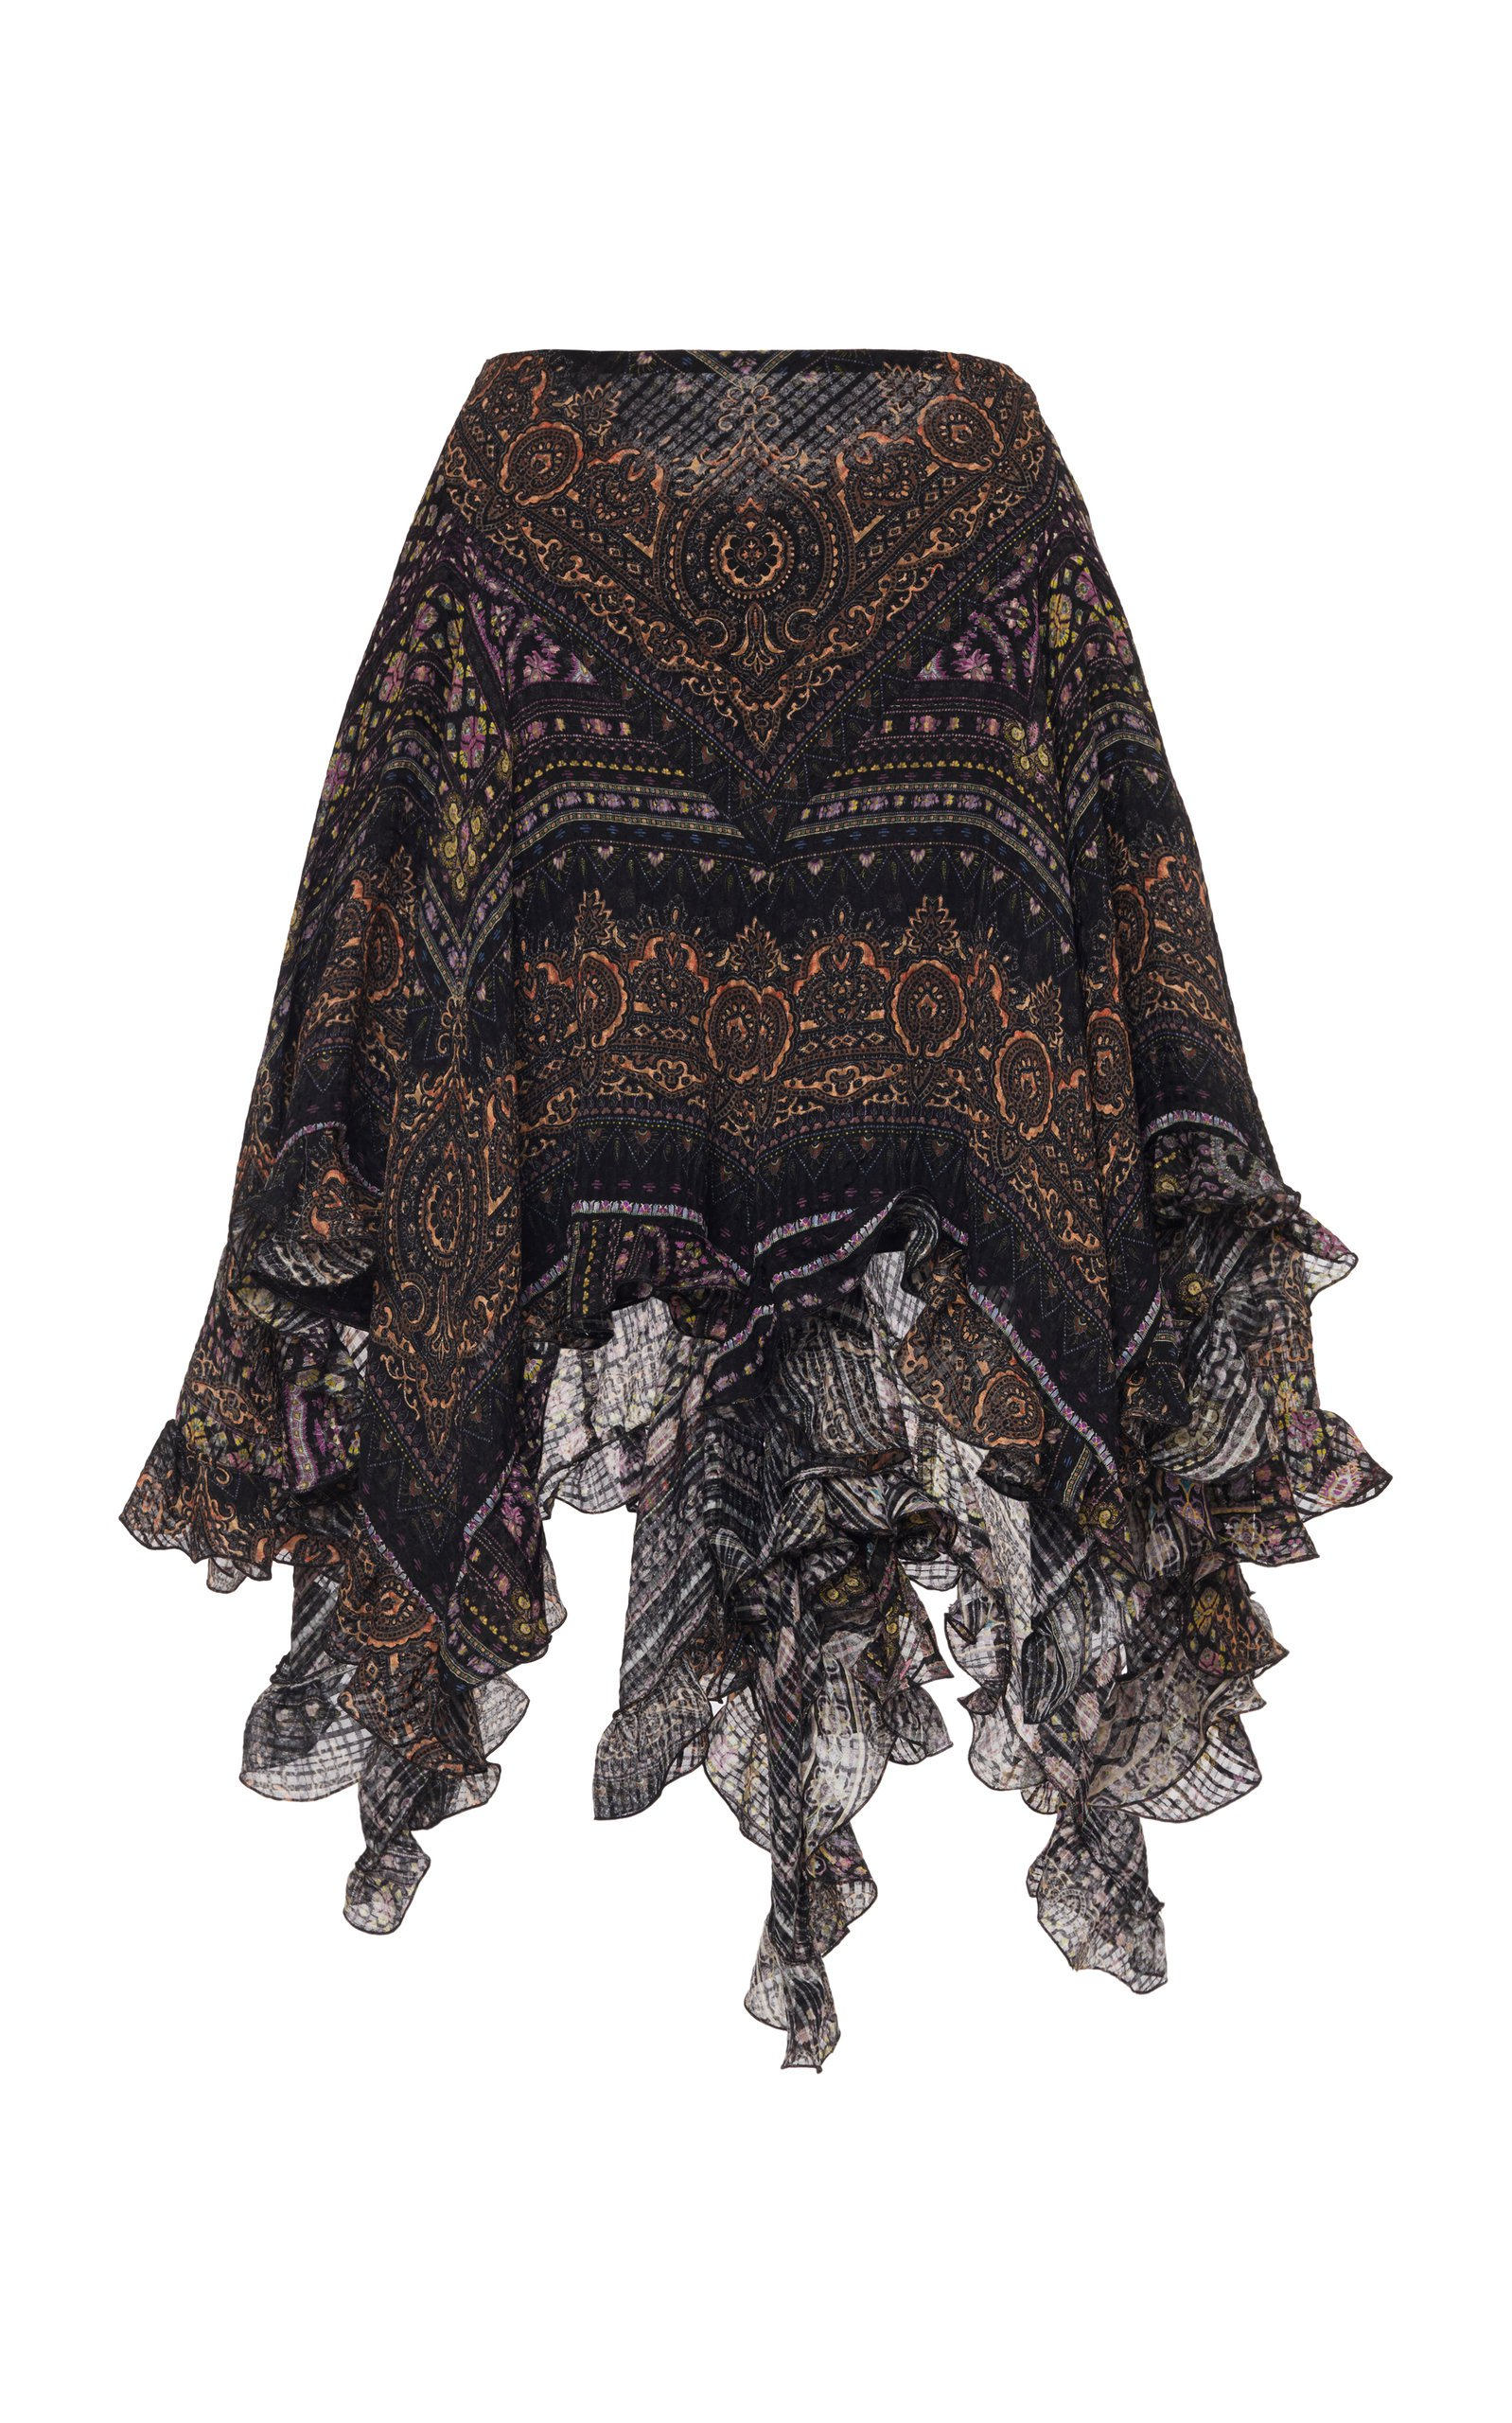 Etro Printed Silk Gauze Skirt Size: 42